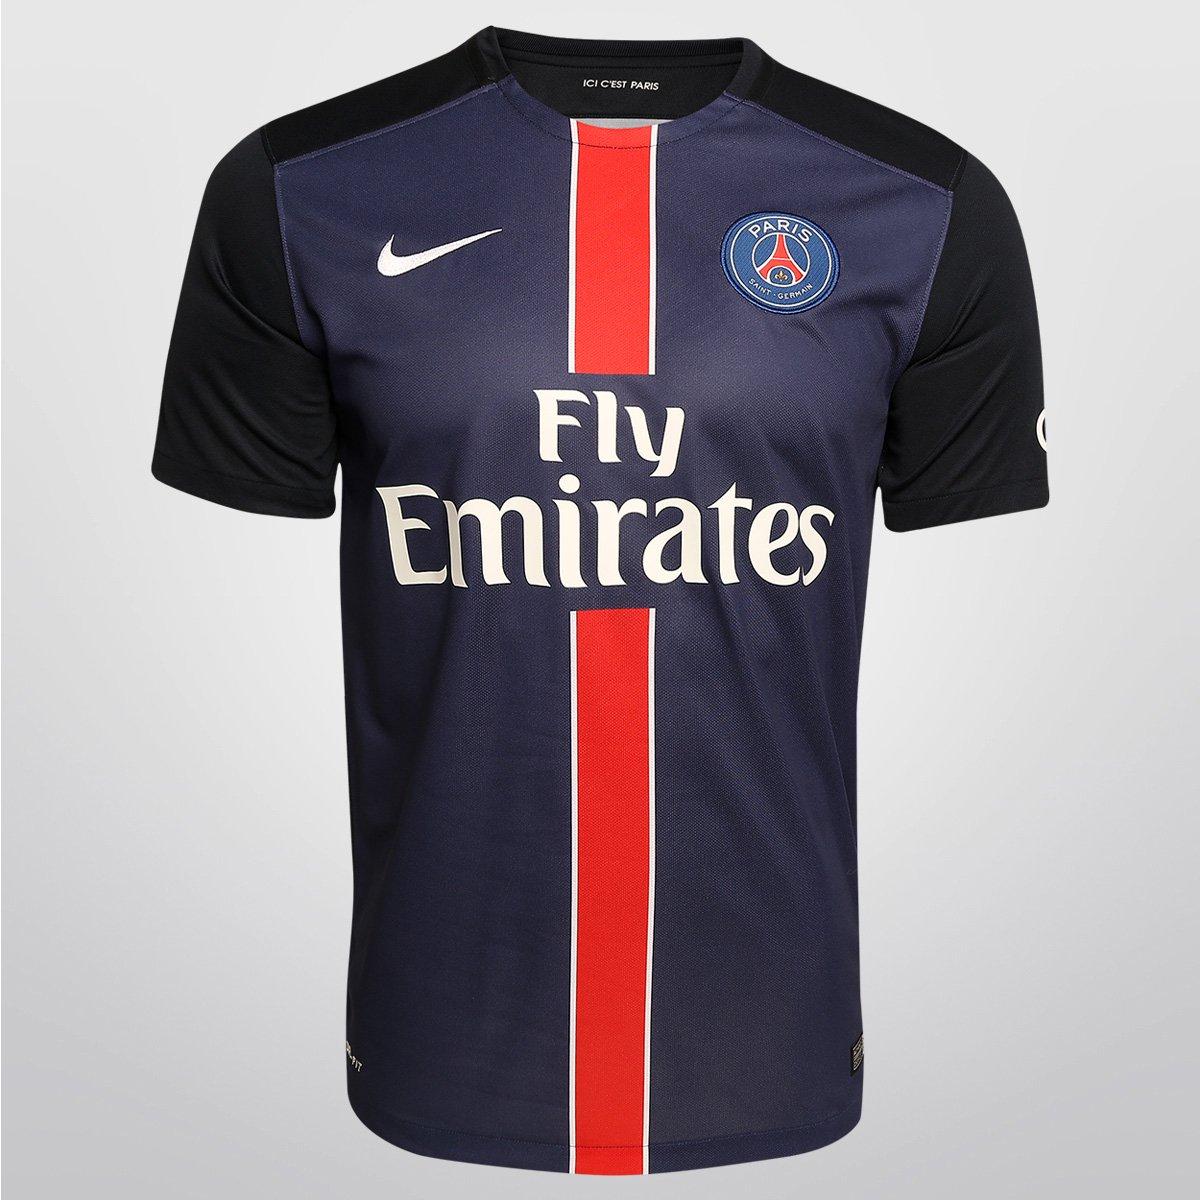 Camisa Nike Paris Saint-Germain Home 15 16 s nº - Compre Agora ... bc3f4957e31b5